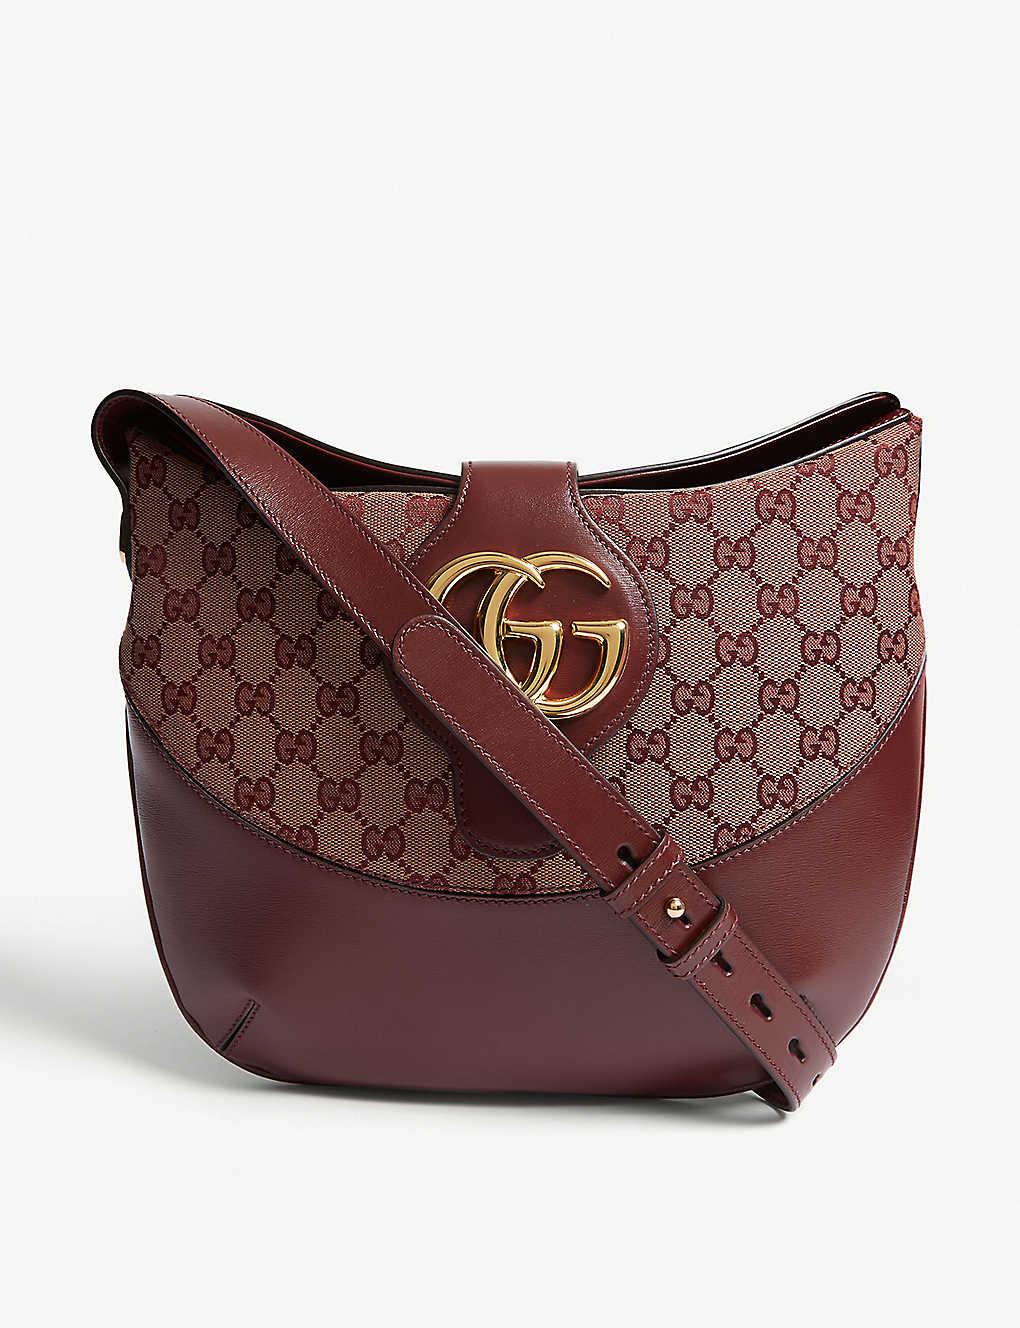 0e392deaf GUCCI - Arli leather shoulder bag | Selfridges.com